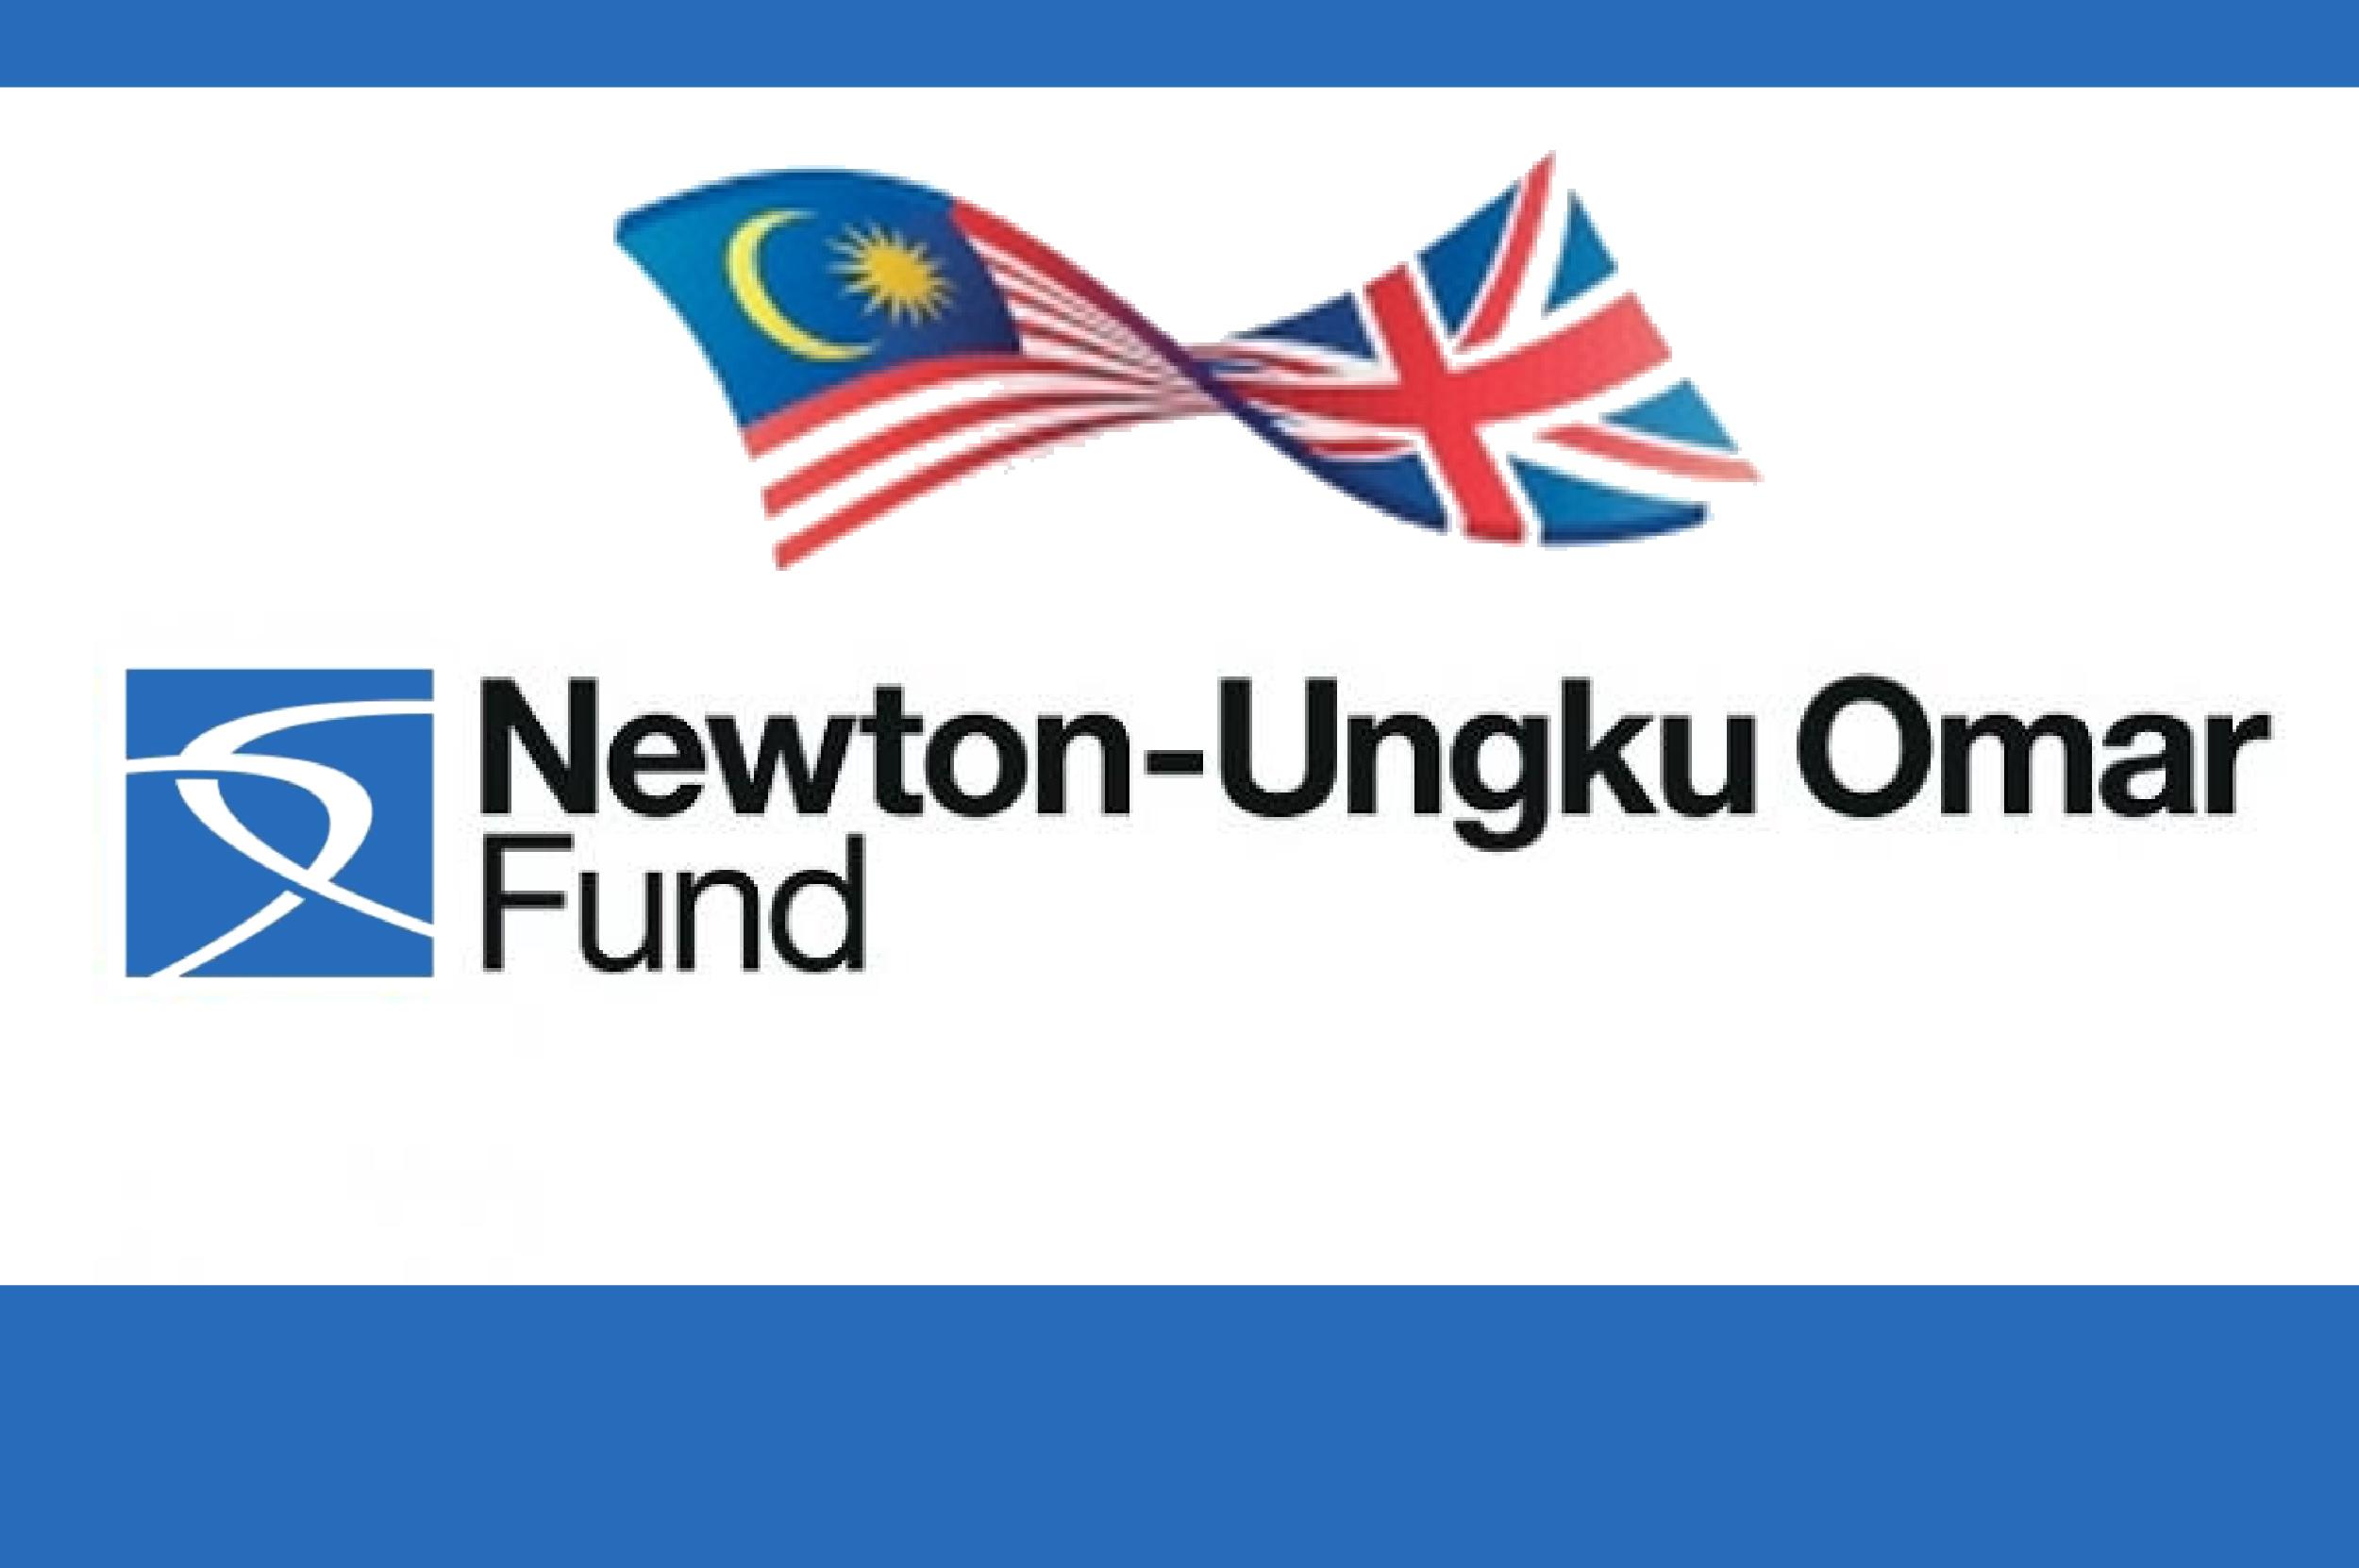 Newton-Ungku Omar Fund